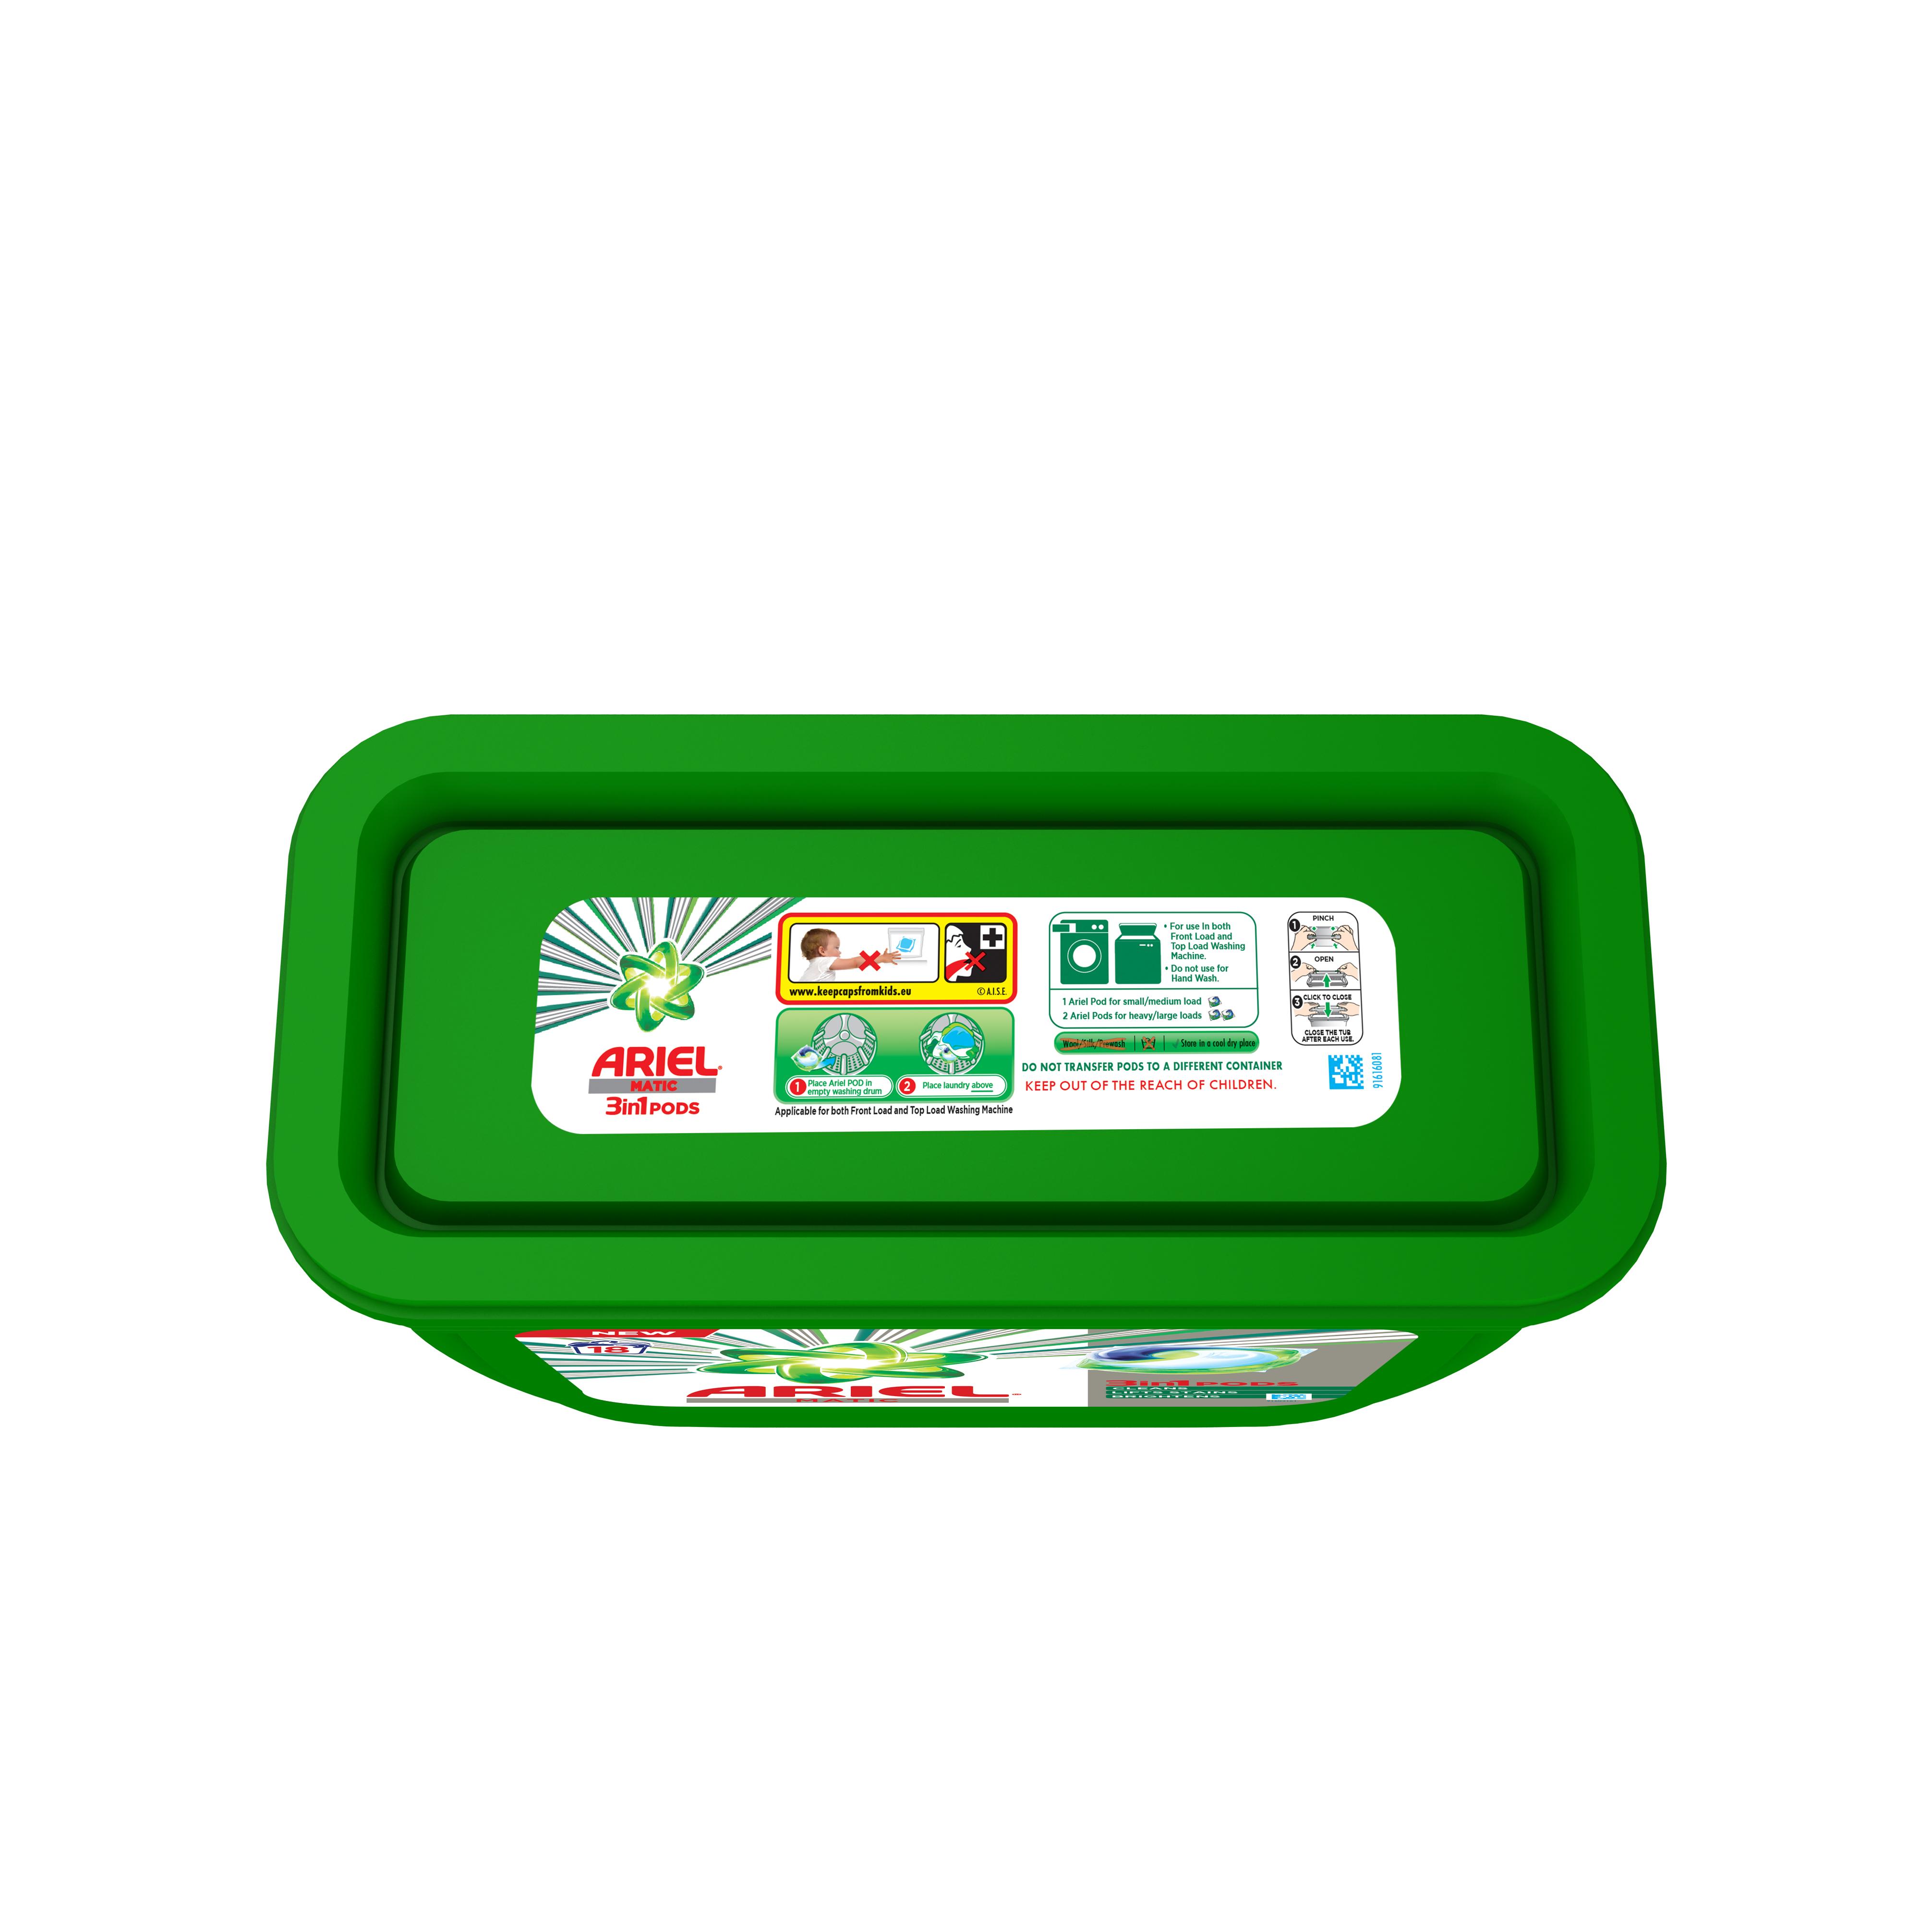 Ariel Matic 3in1 PODs Detergent Pack 18 ct